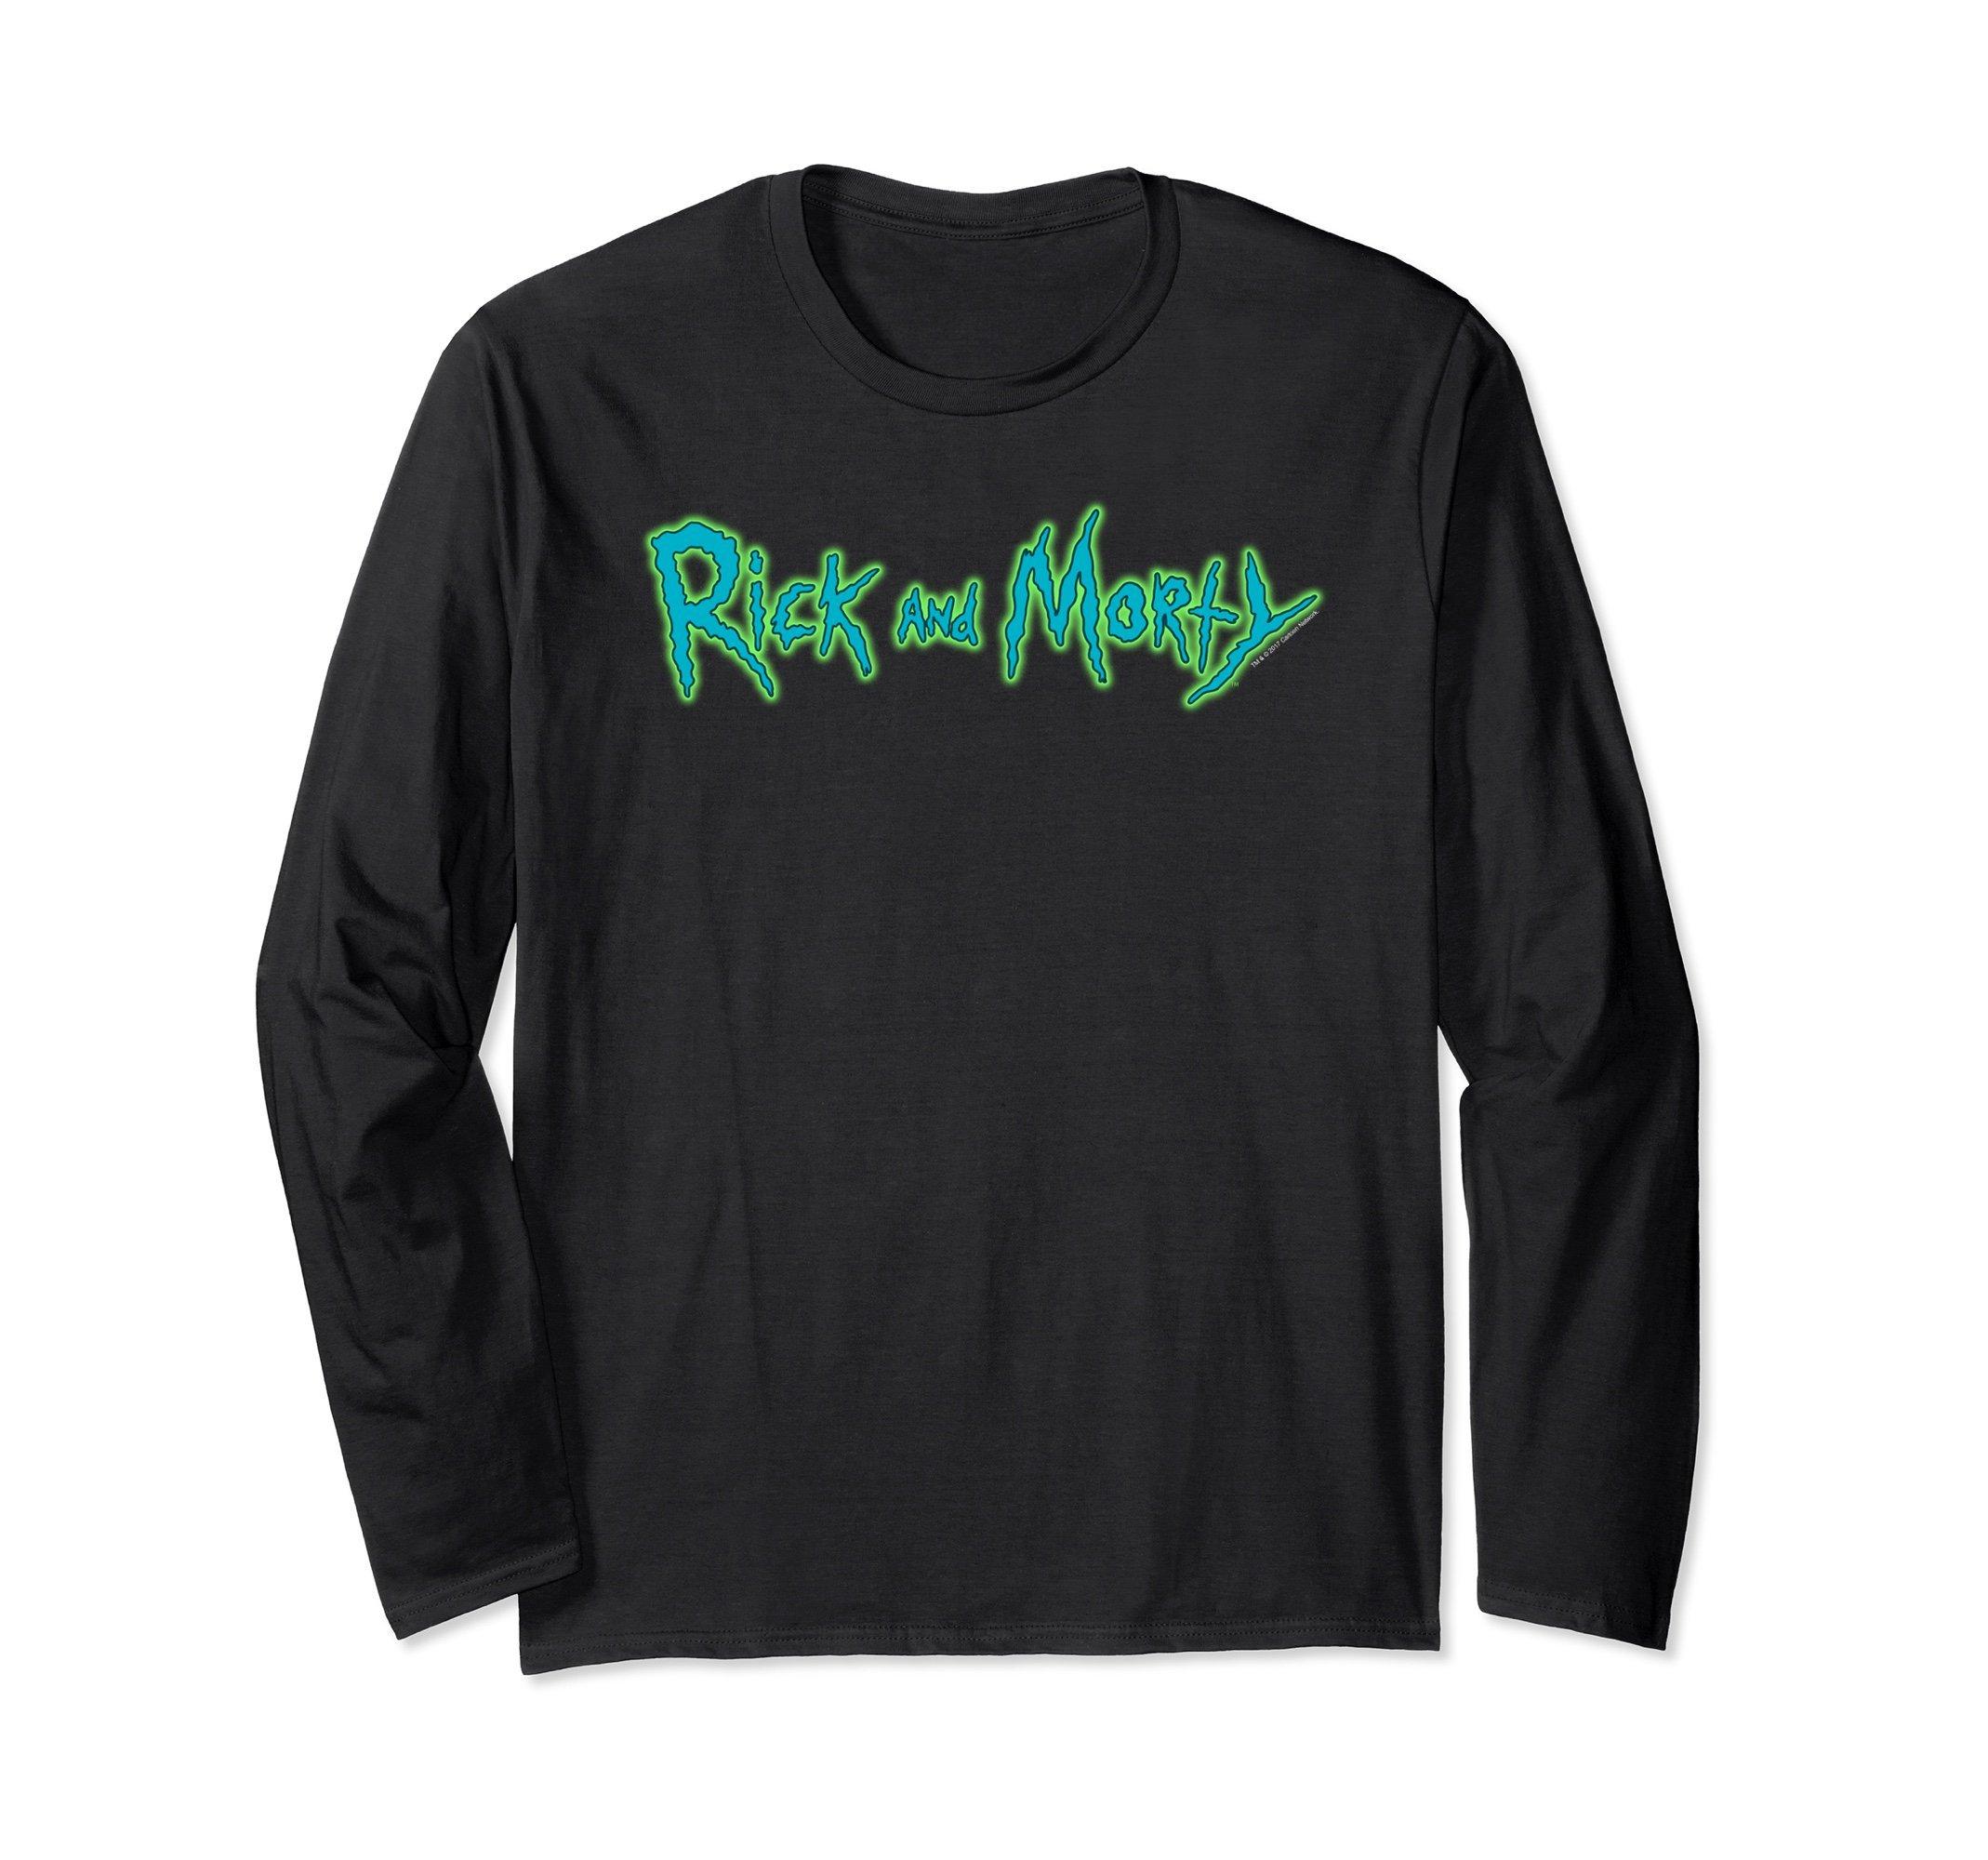 Rick Morty Horizontal Logo Shirts